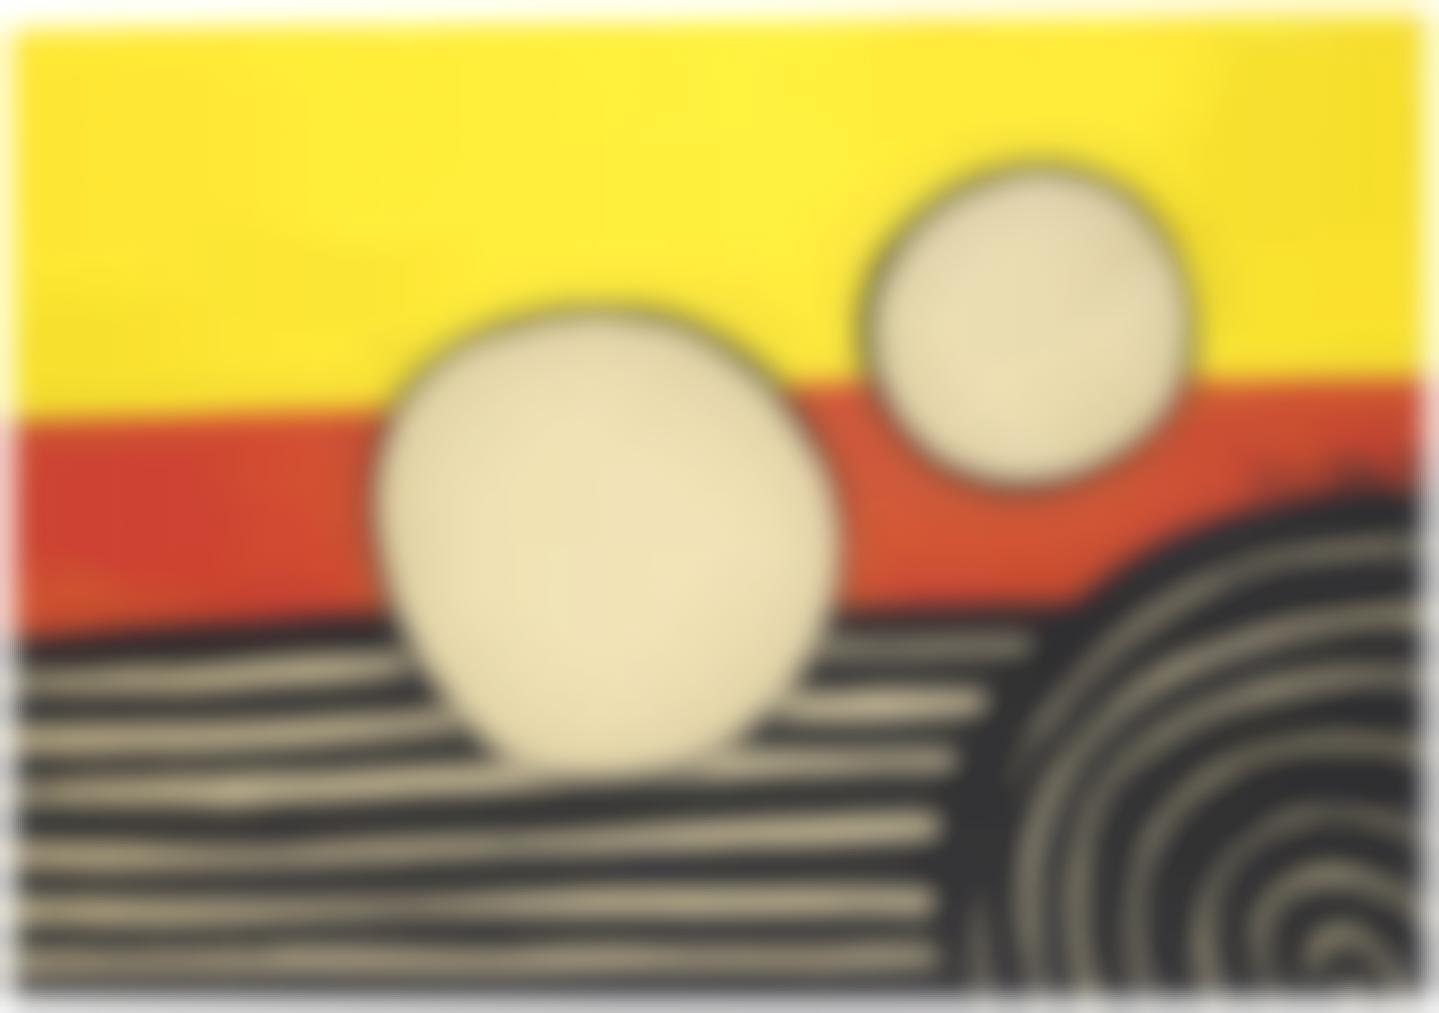 Alexander Calder-Floating White Orbs-1975